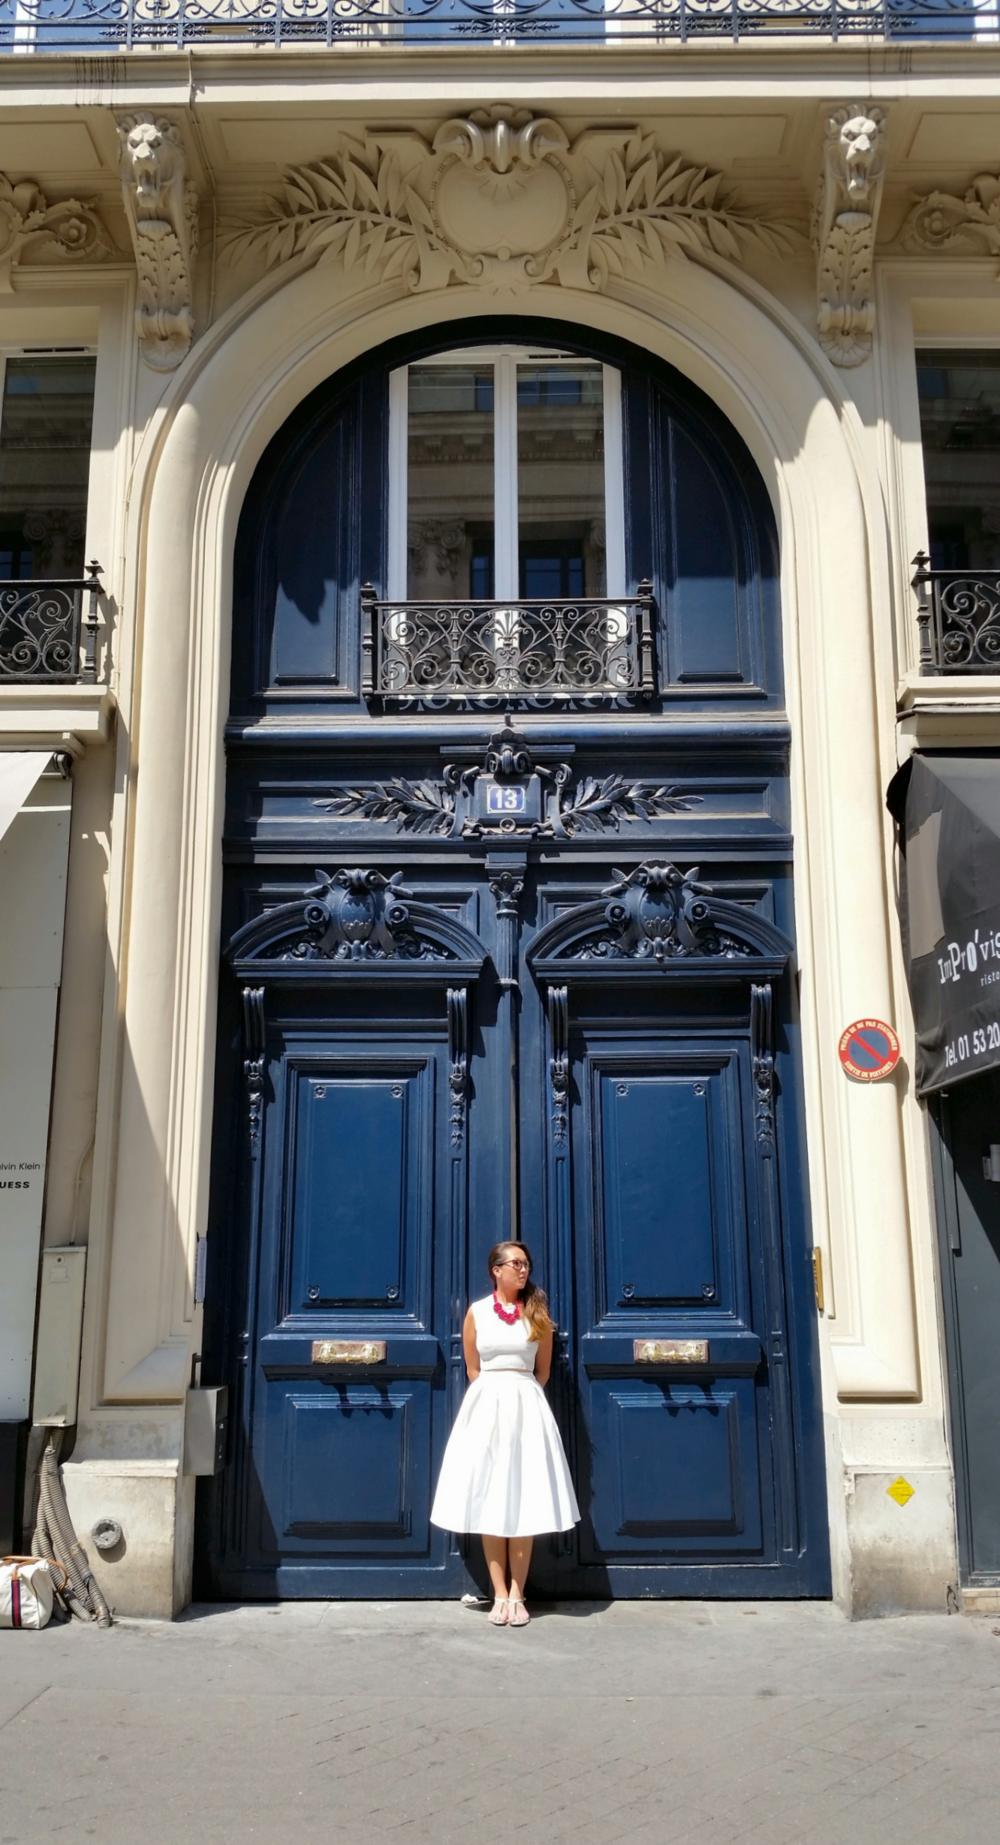 PARIS A sunny day in Saint Germain des Pres